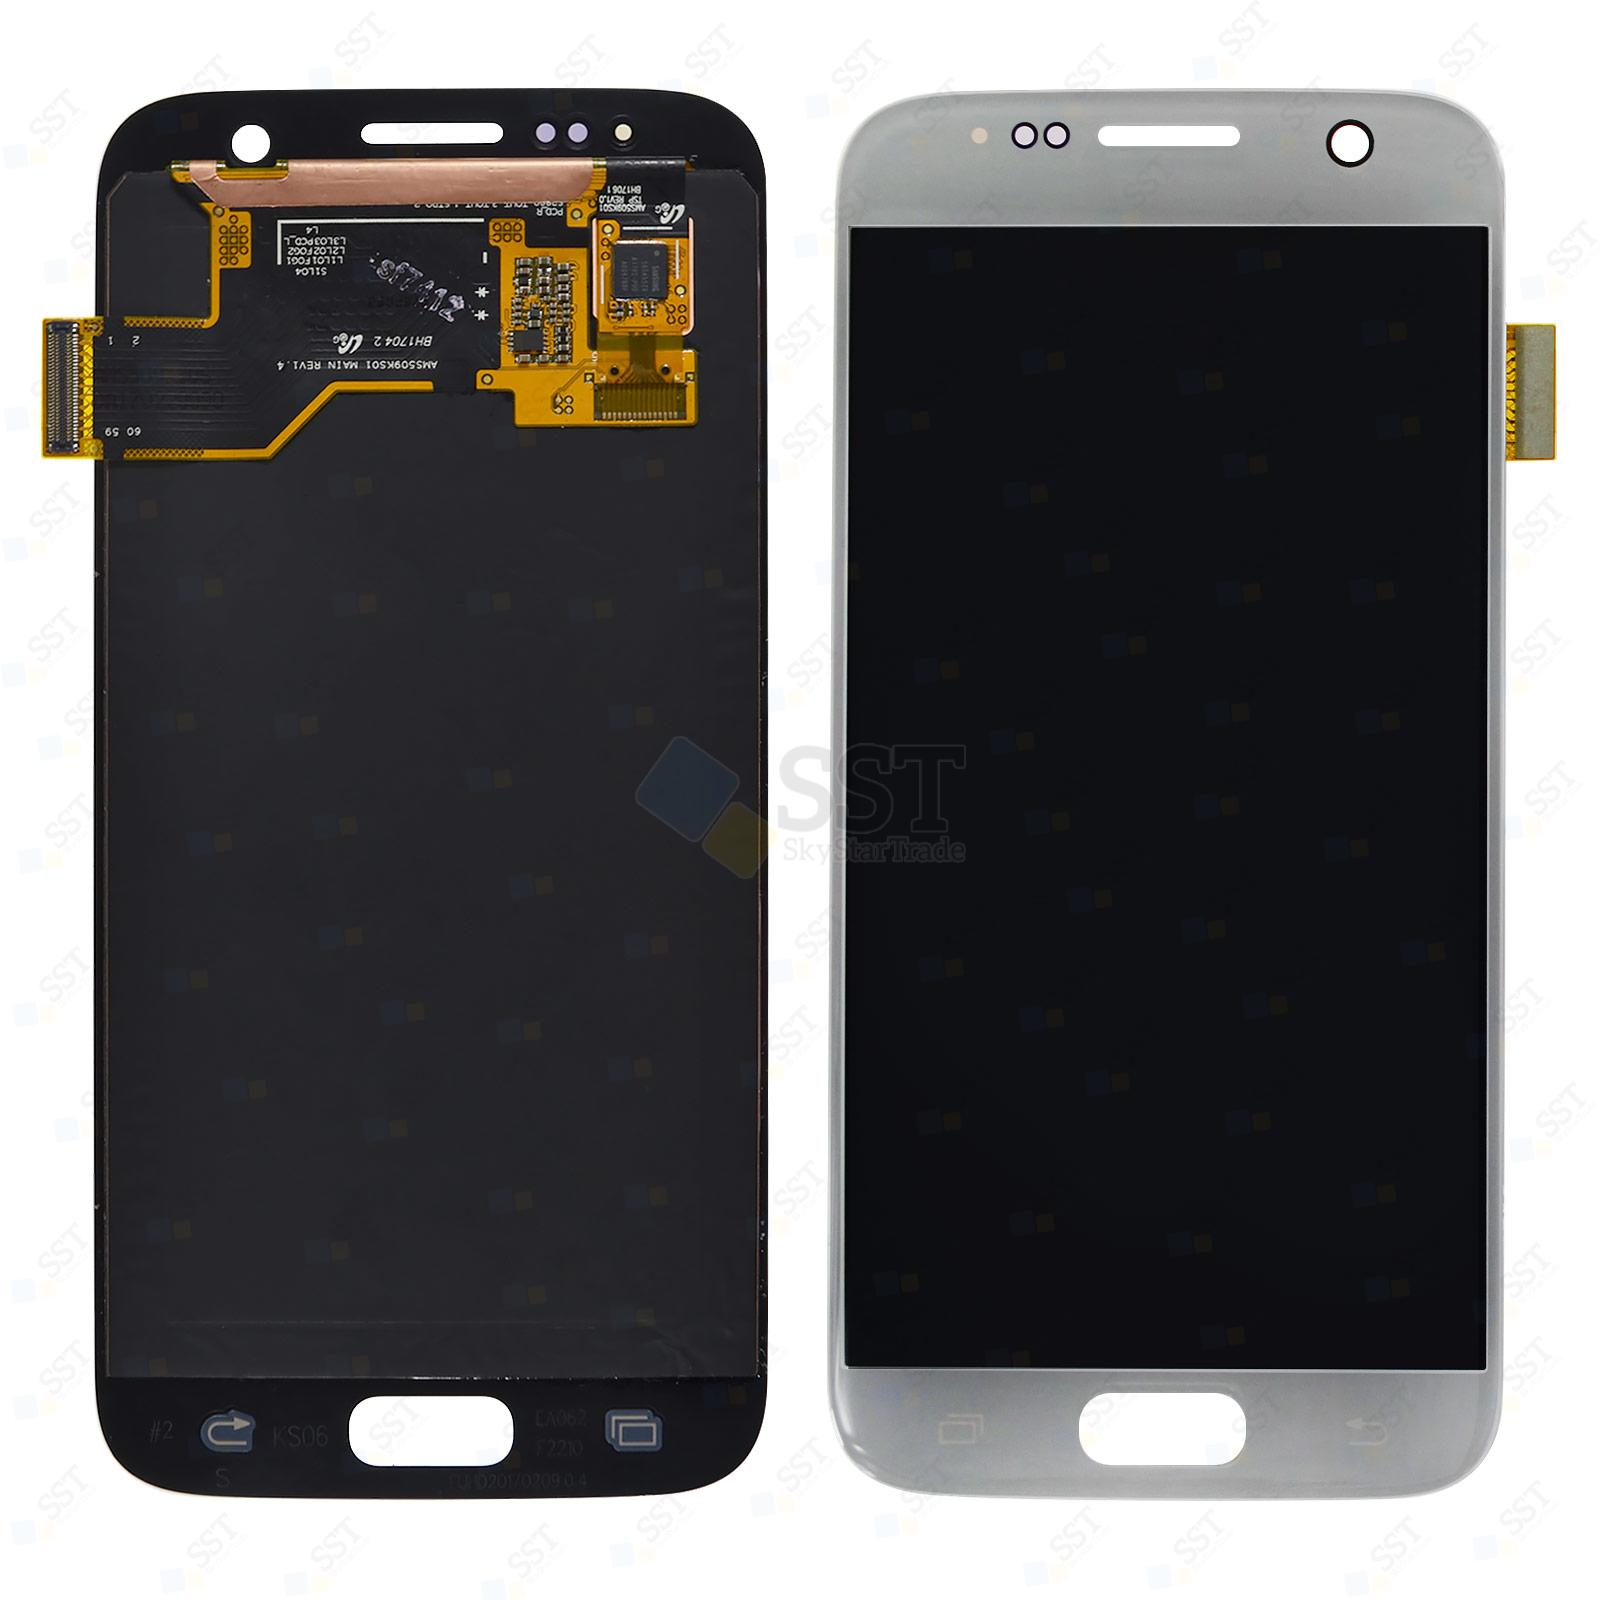 Samsung Galaxy S7 G930 G930F G930A G930V G930P G930T G930R4 G930W8 LCD Screen Digitizer, Silver, No Logo